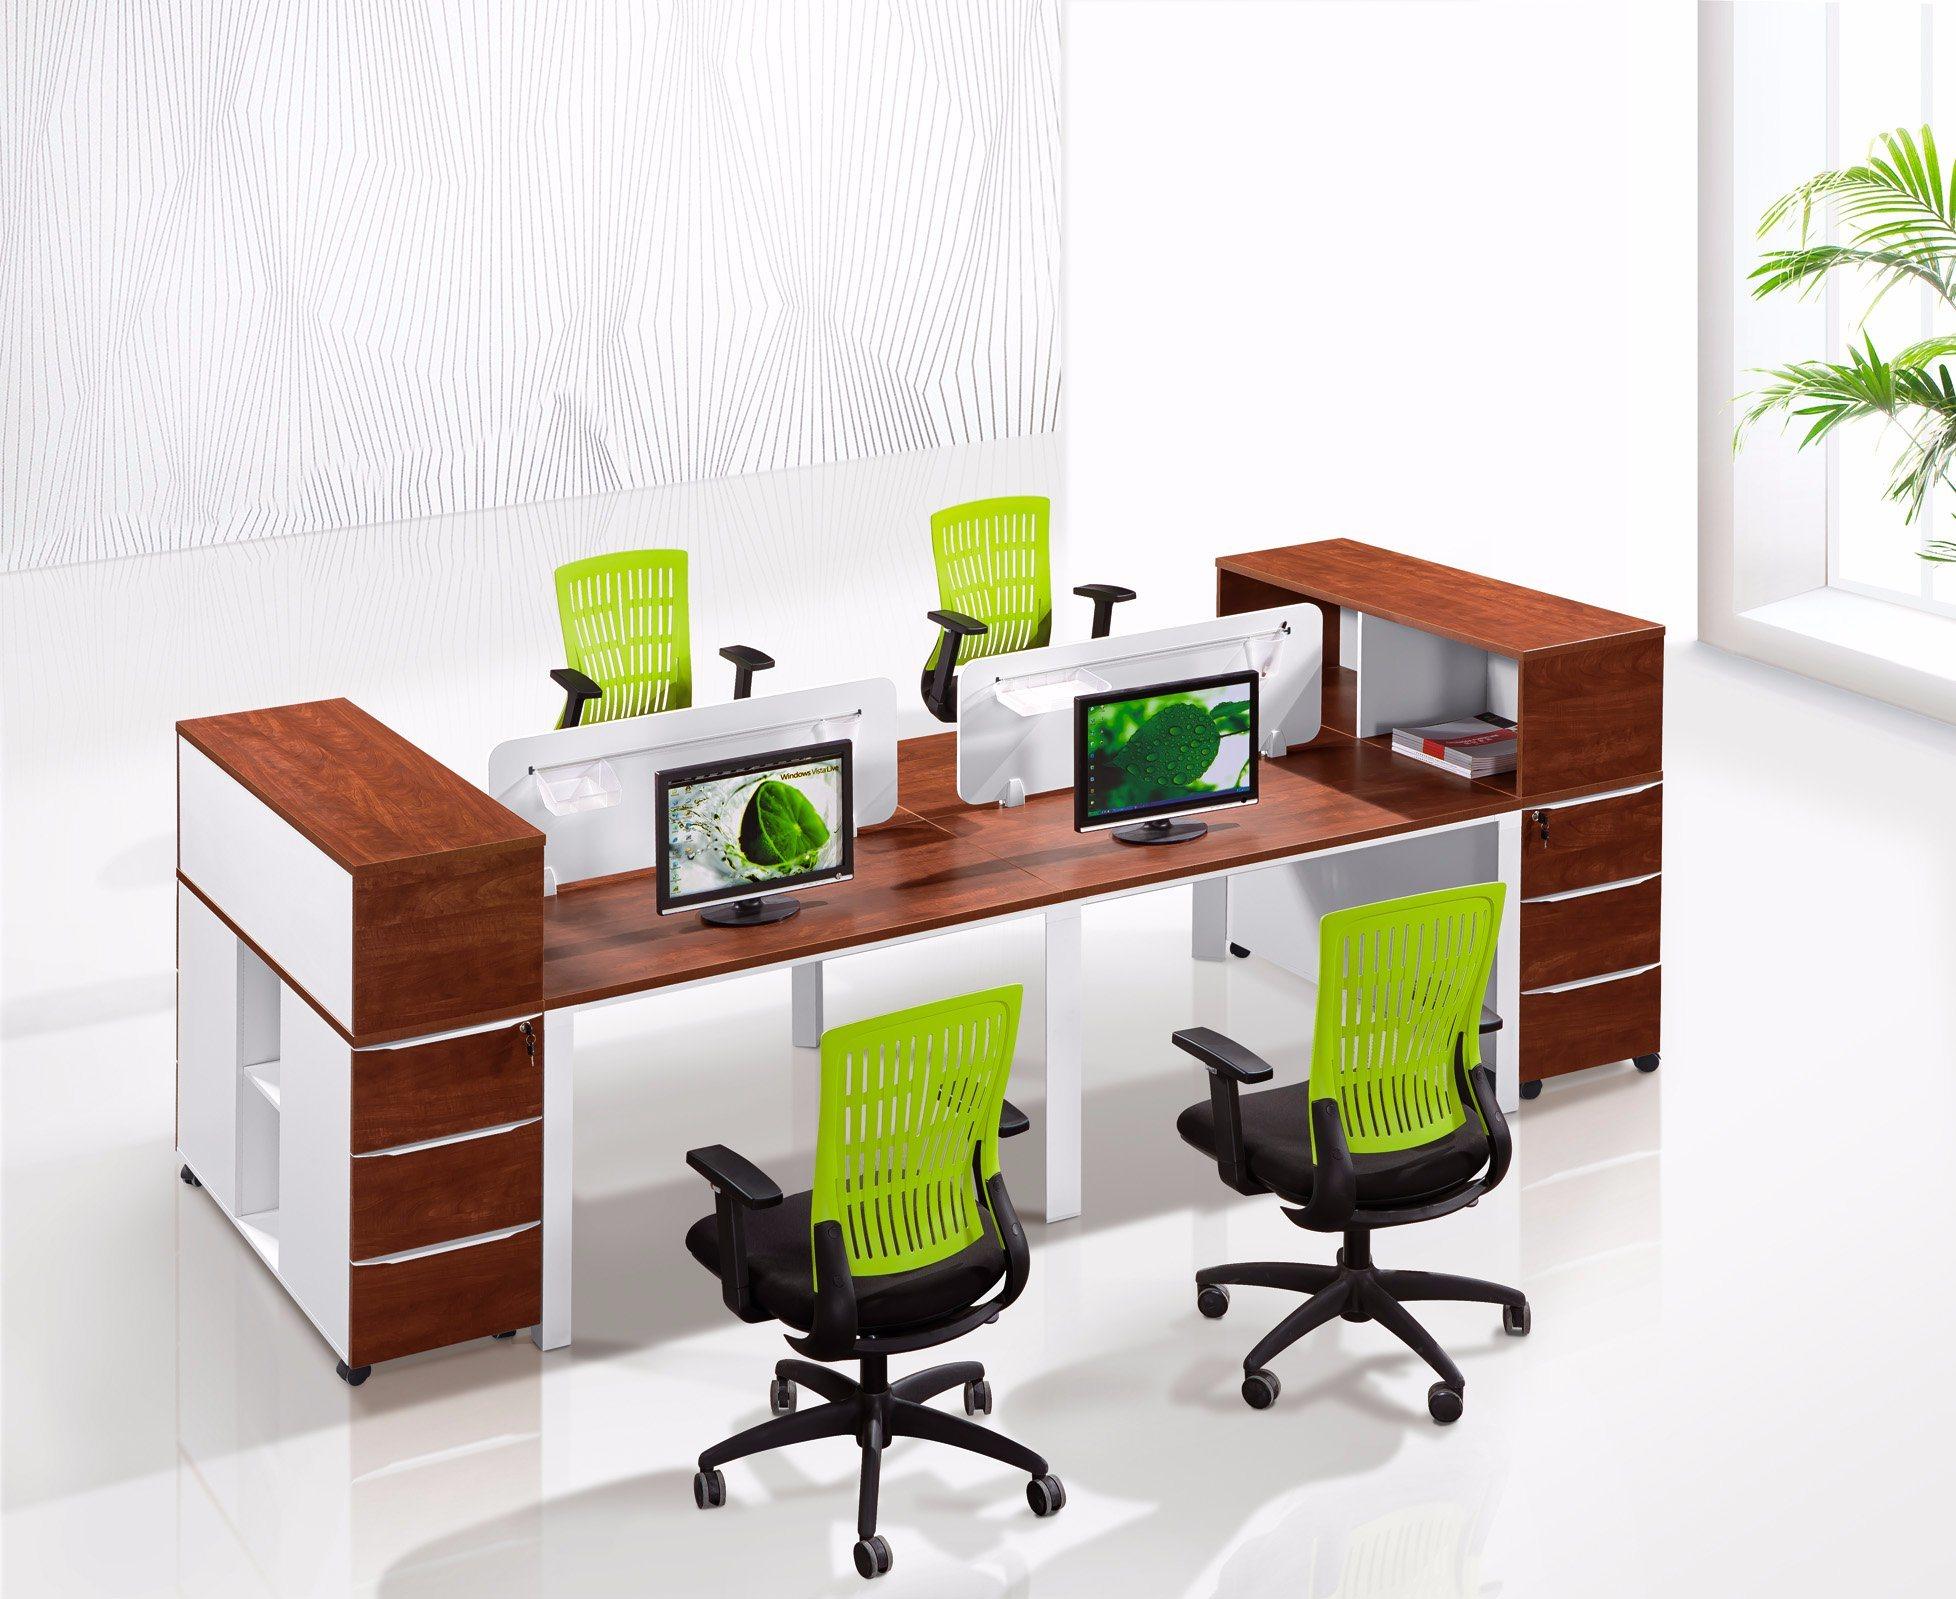 Mdf Parititon Wood Furniture Office Desk Divider Screen Workstation